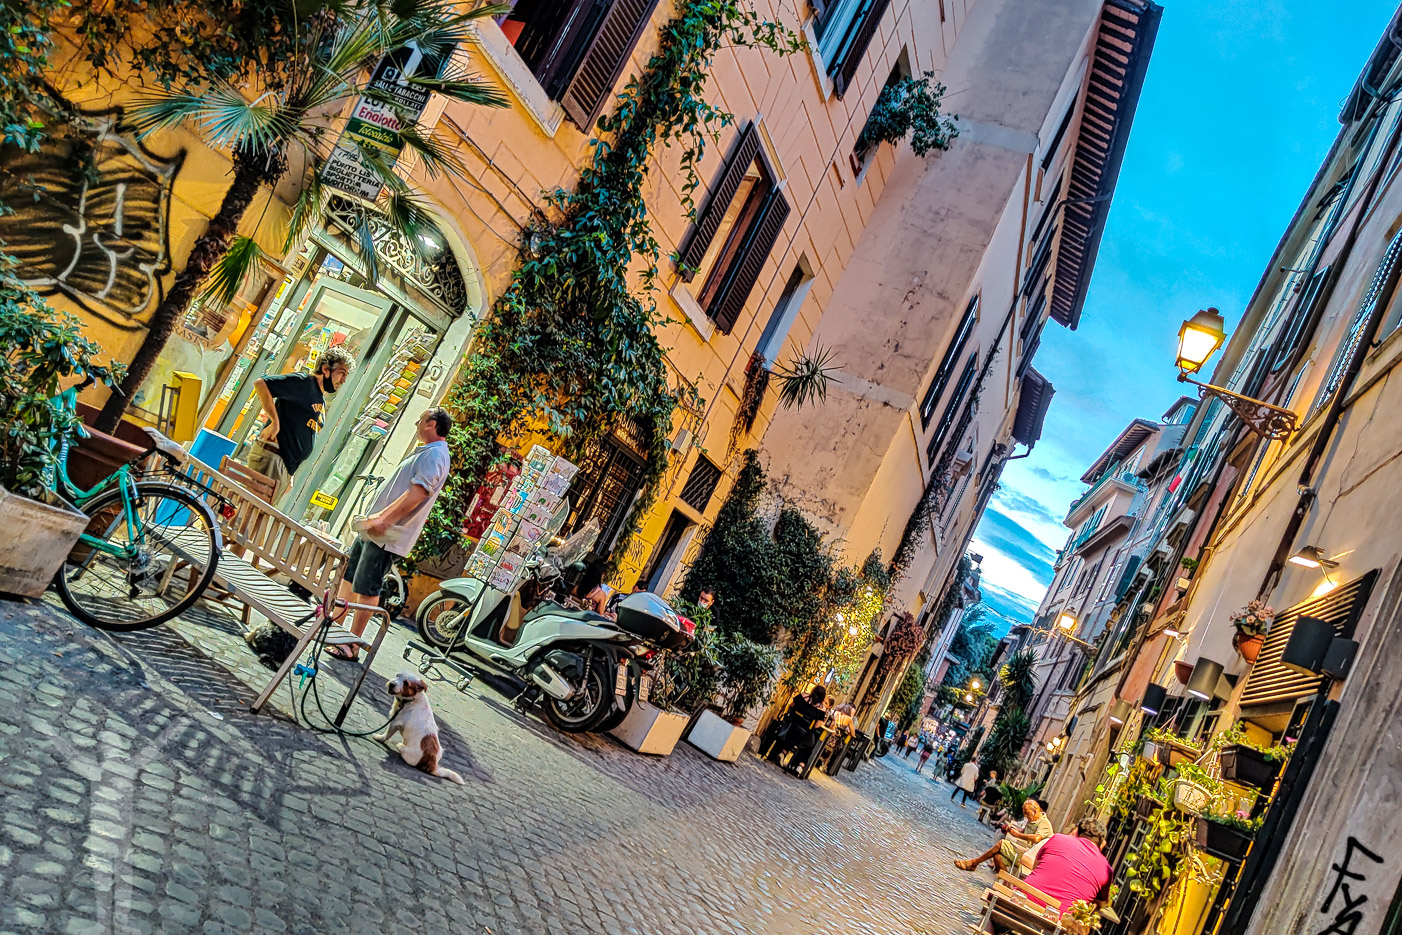 Kväll i Trastevere